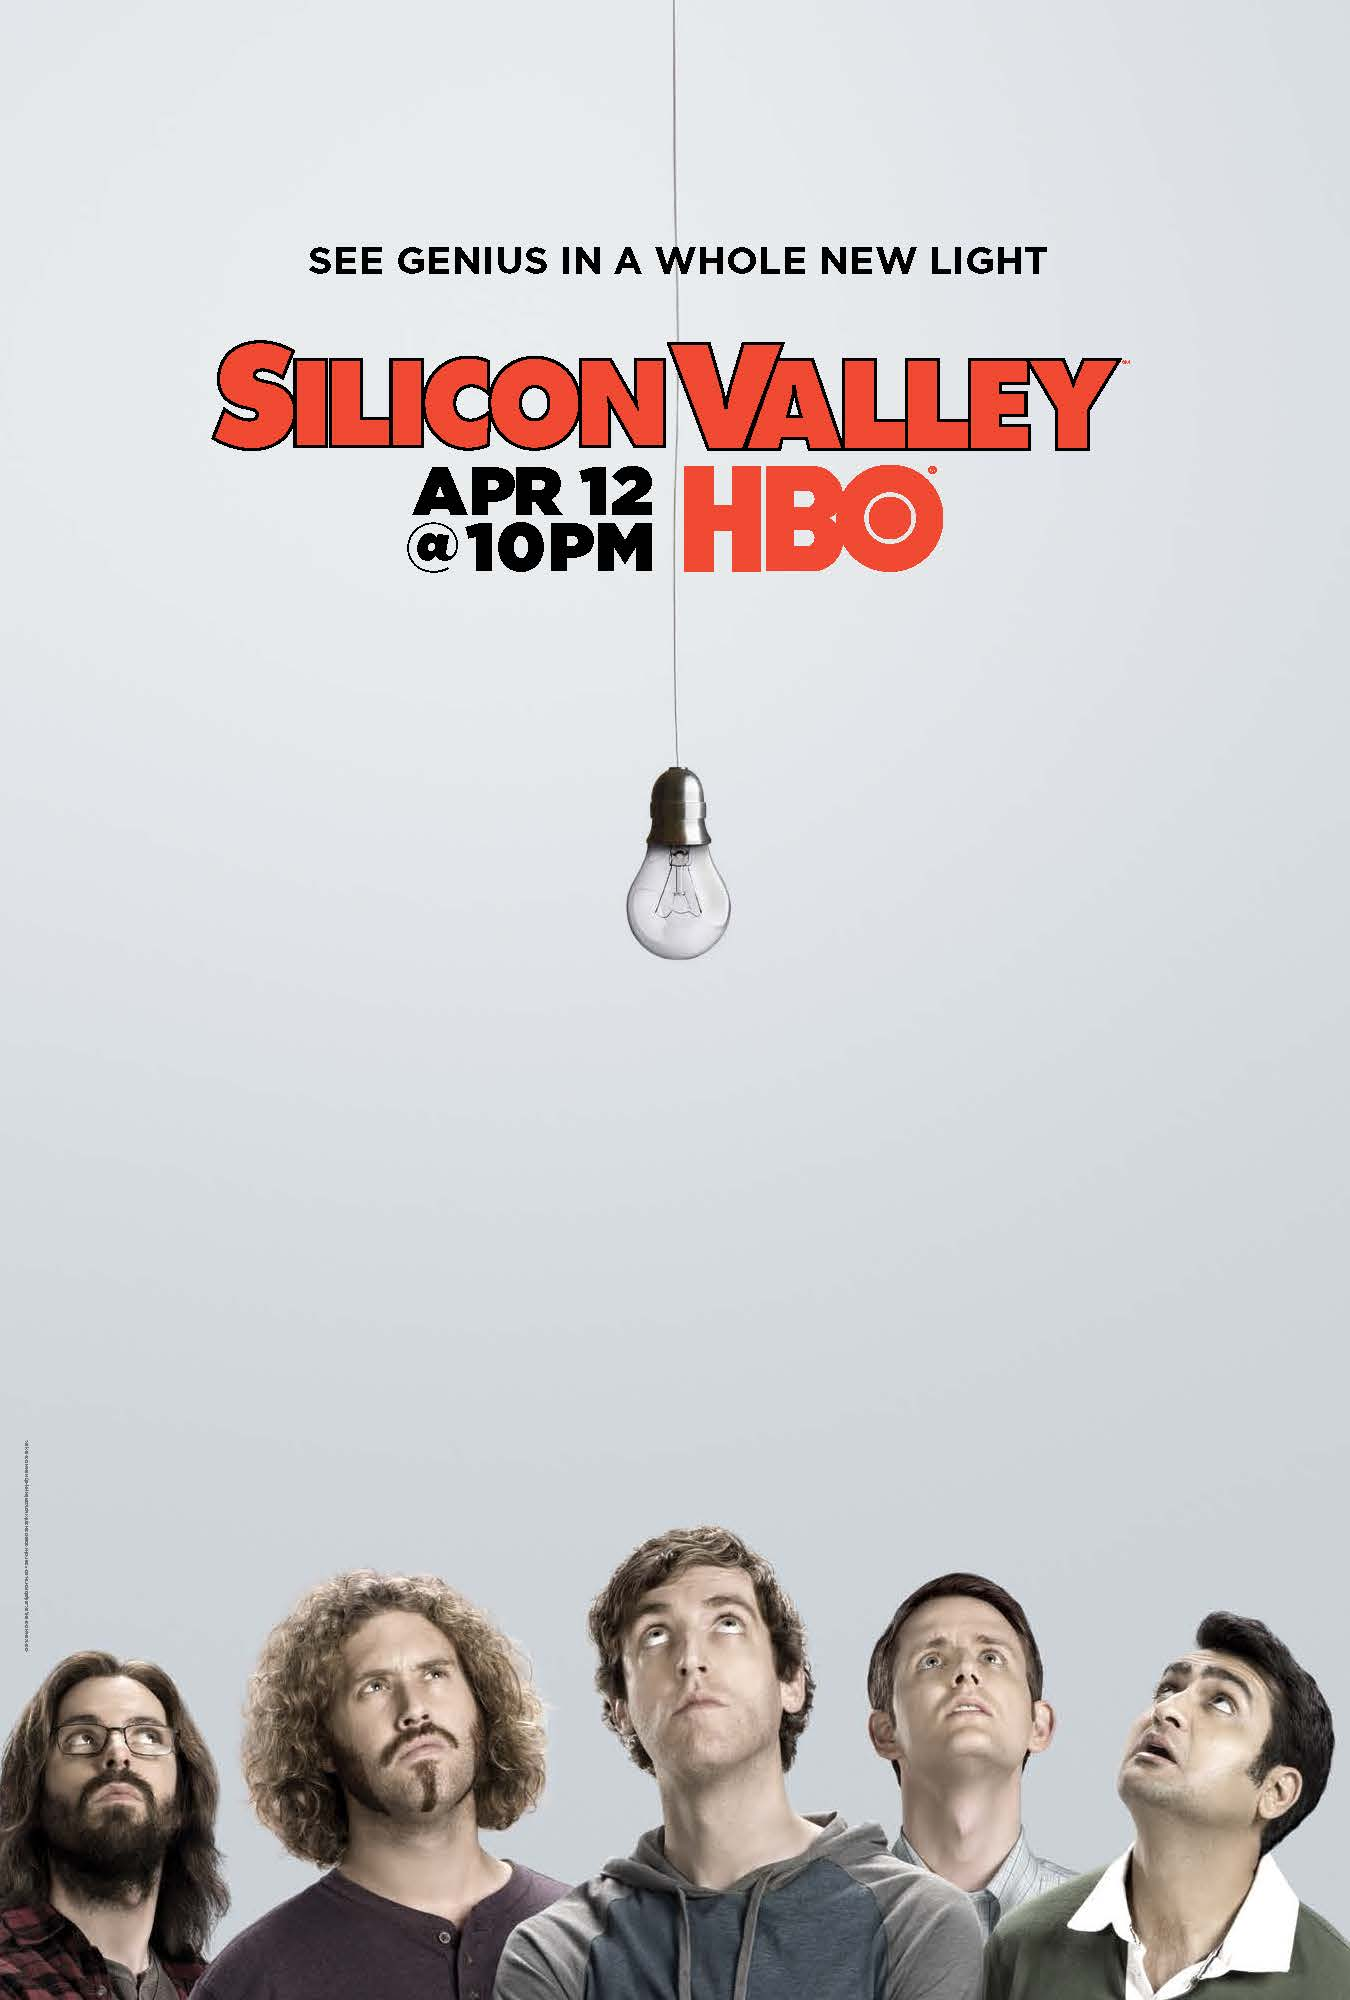 silicon-valley-season-2-poster-image.jpg